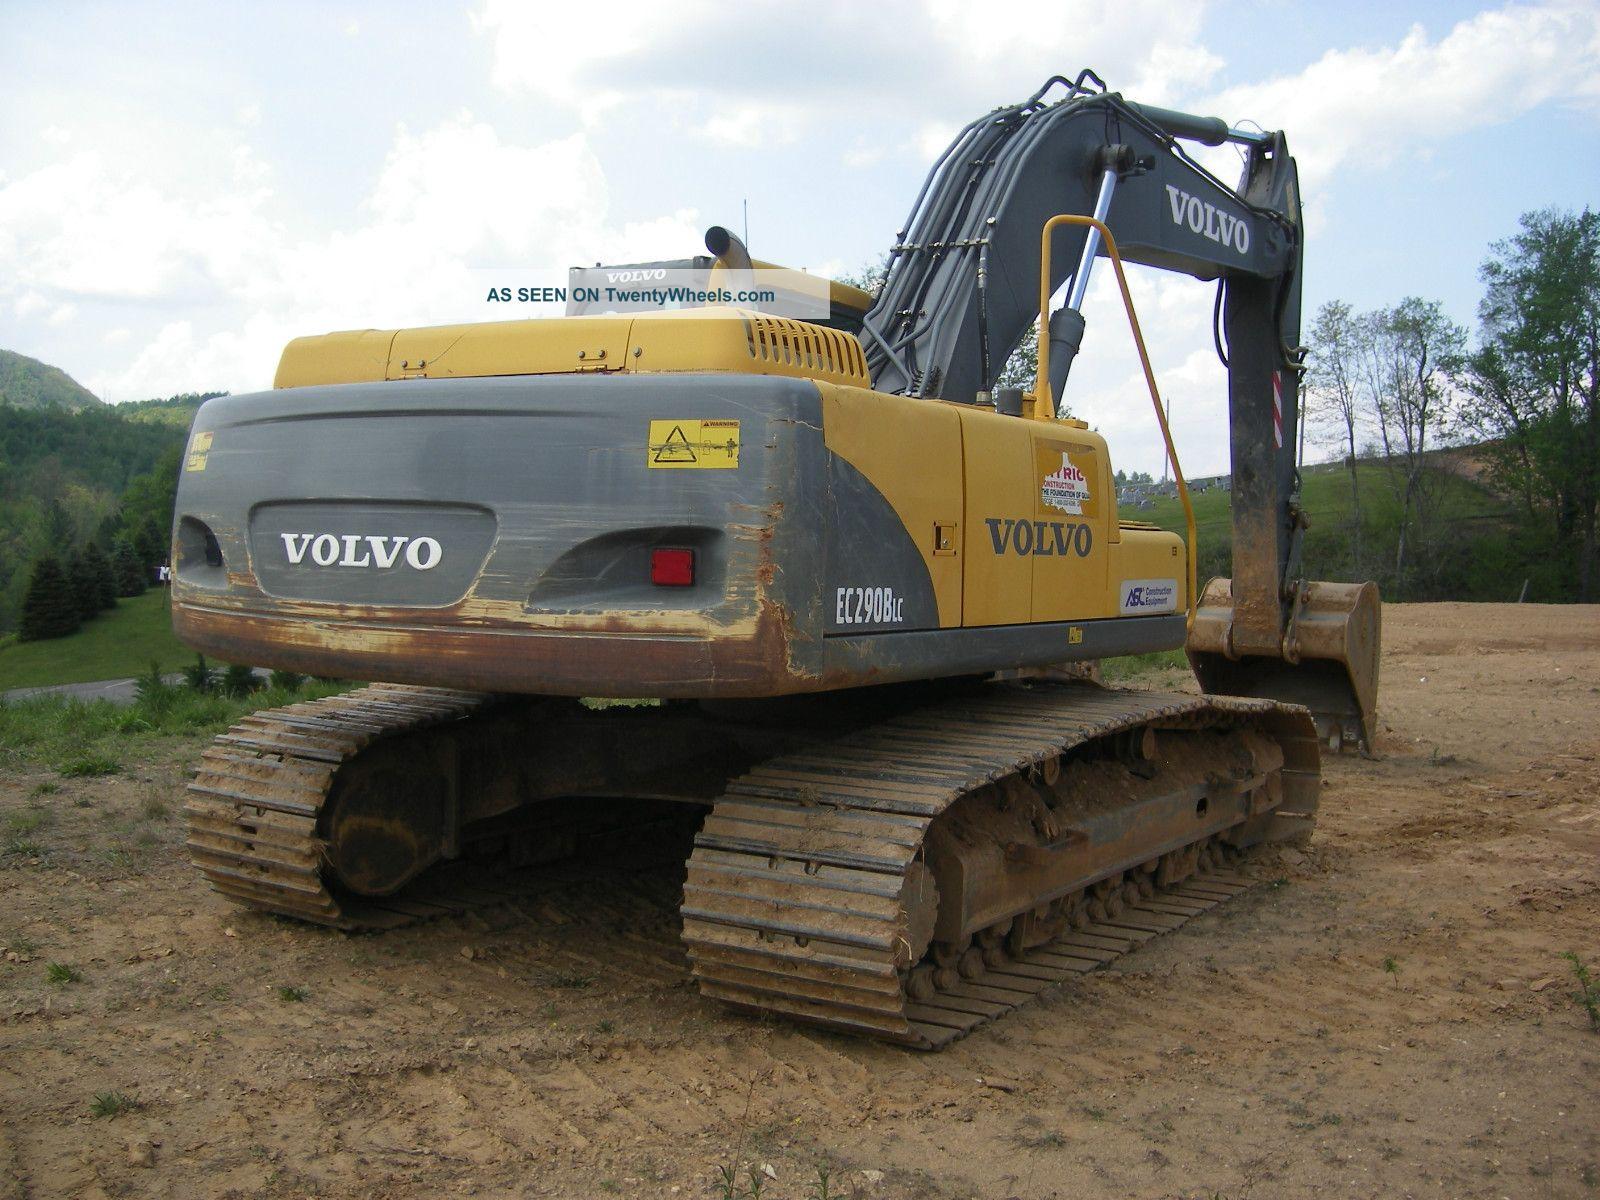 Volvo Owners Manuals2001 Mitsubishi Fuso Wiring Diagram 1996 2001 2005 Ec290blc Hydraulic Excavator